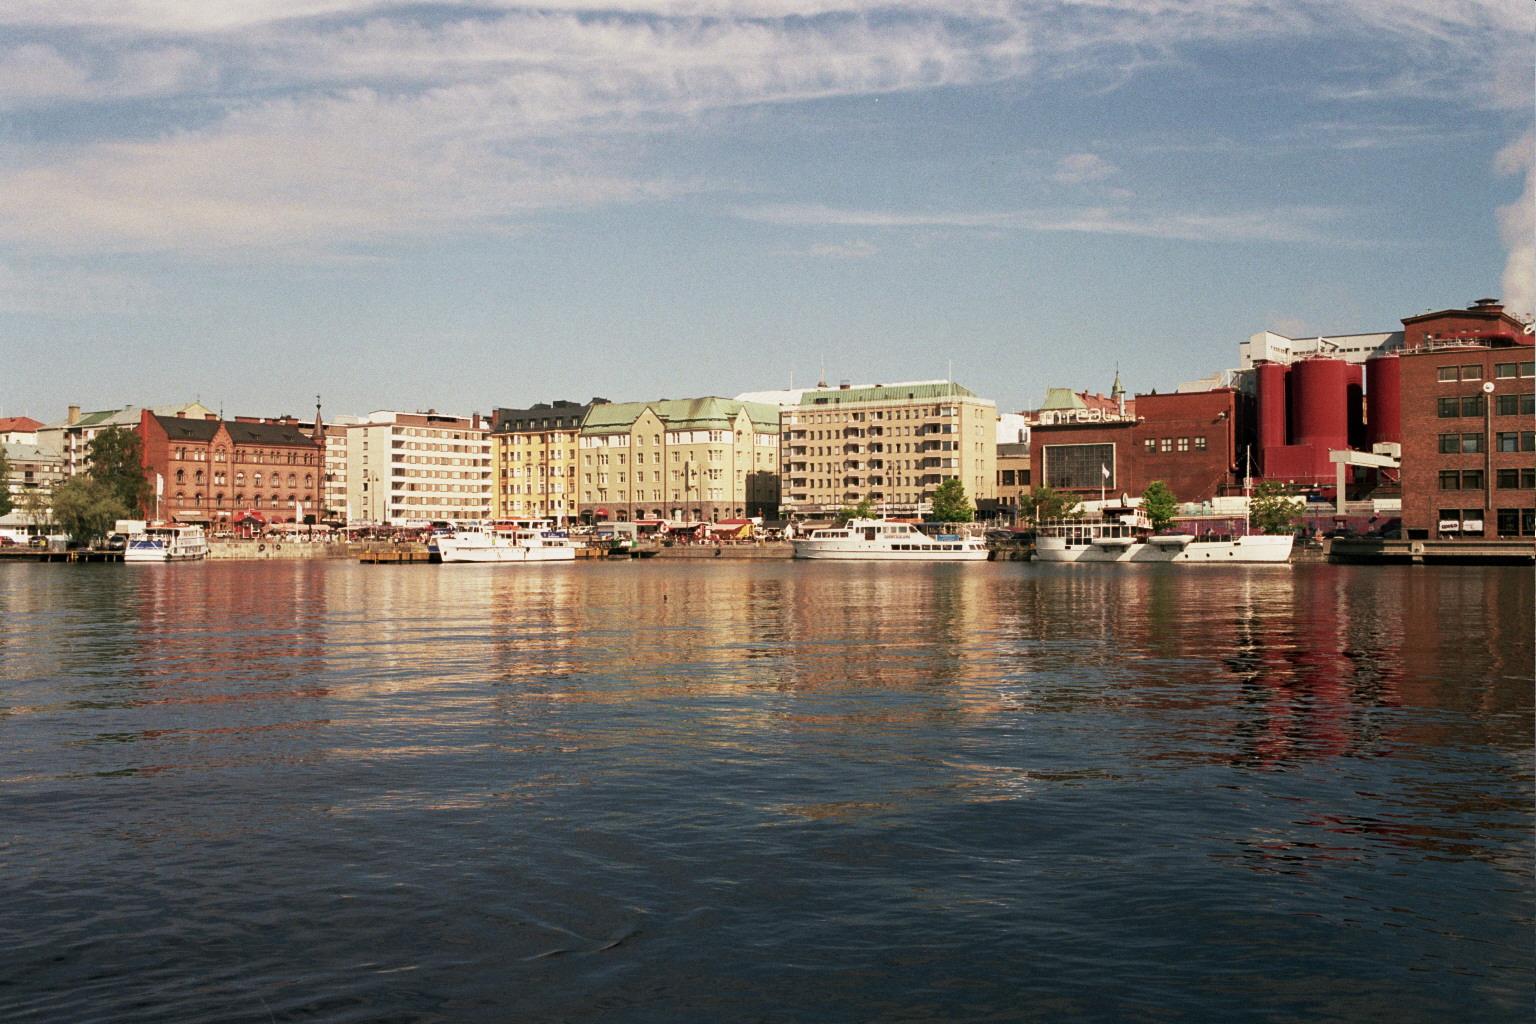 Ratina Tampere